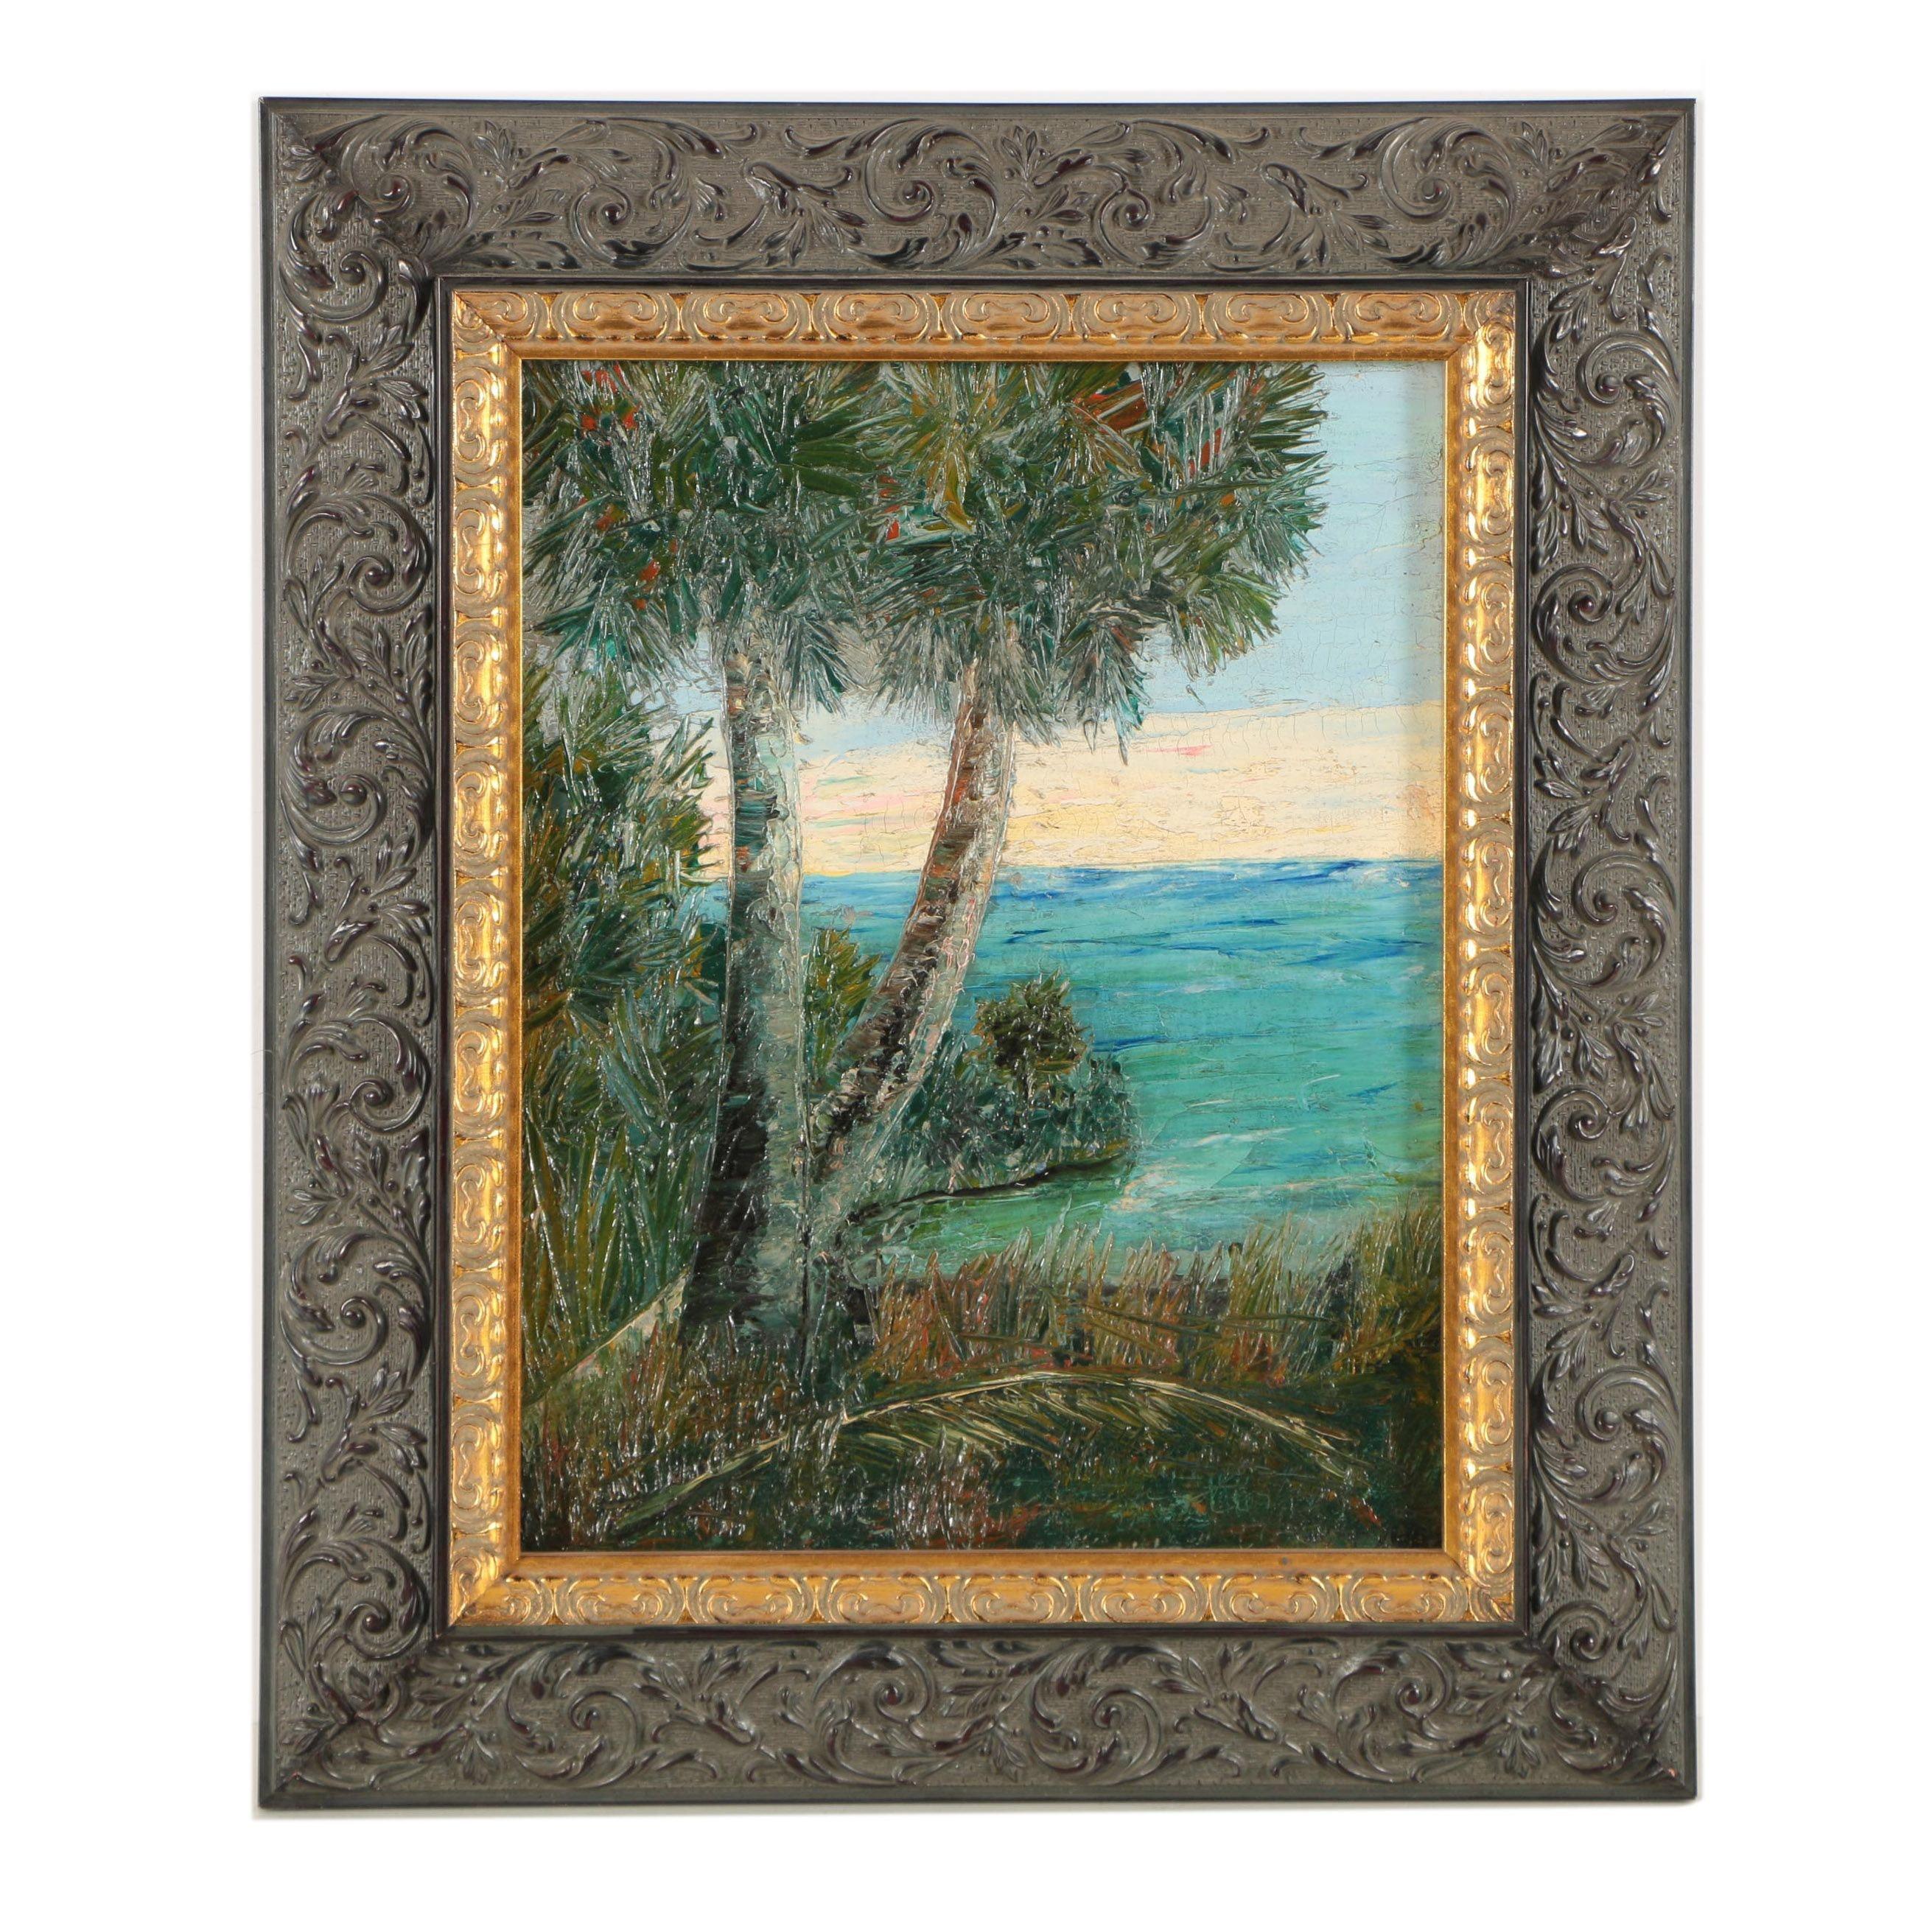 Catherine L. Condra Oil Painting Tropical Landscape